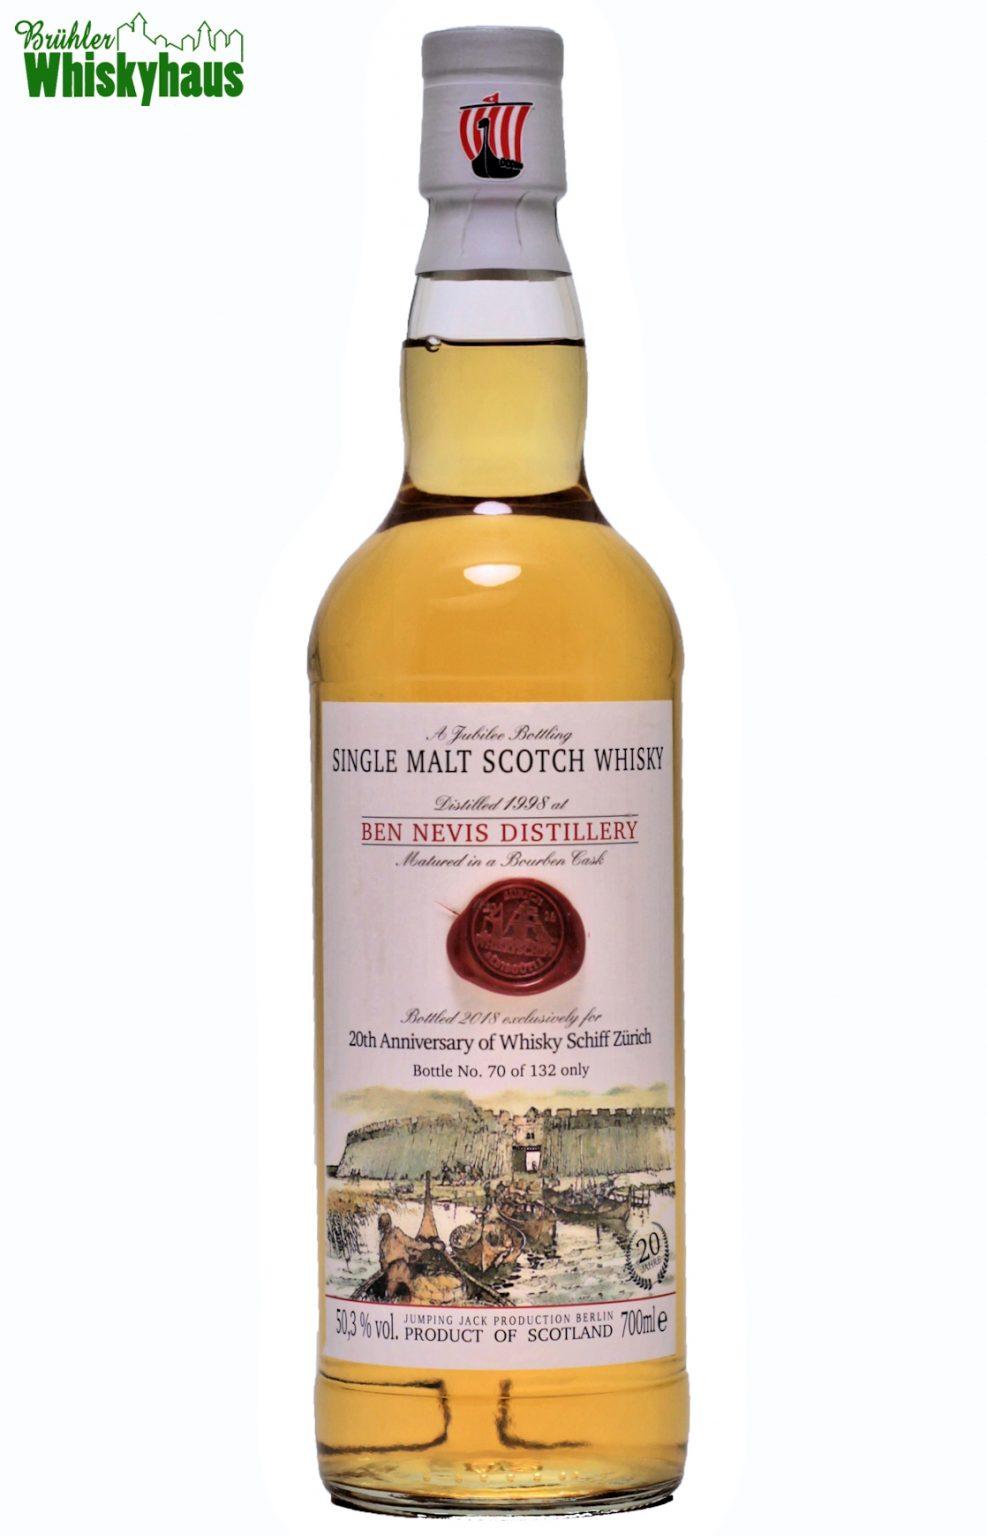 "Ben Nevis 20 Jahre - Bourbon Cask - ""20th Anniversary of Whisky Schiff Zürich"" by Jack Wiebers Whisky World - Highland Single Malt Scotch Whisky"